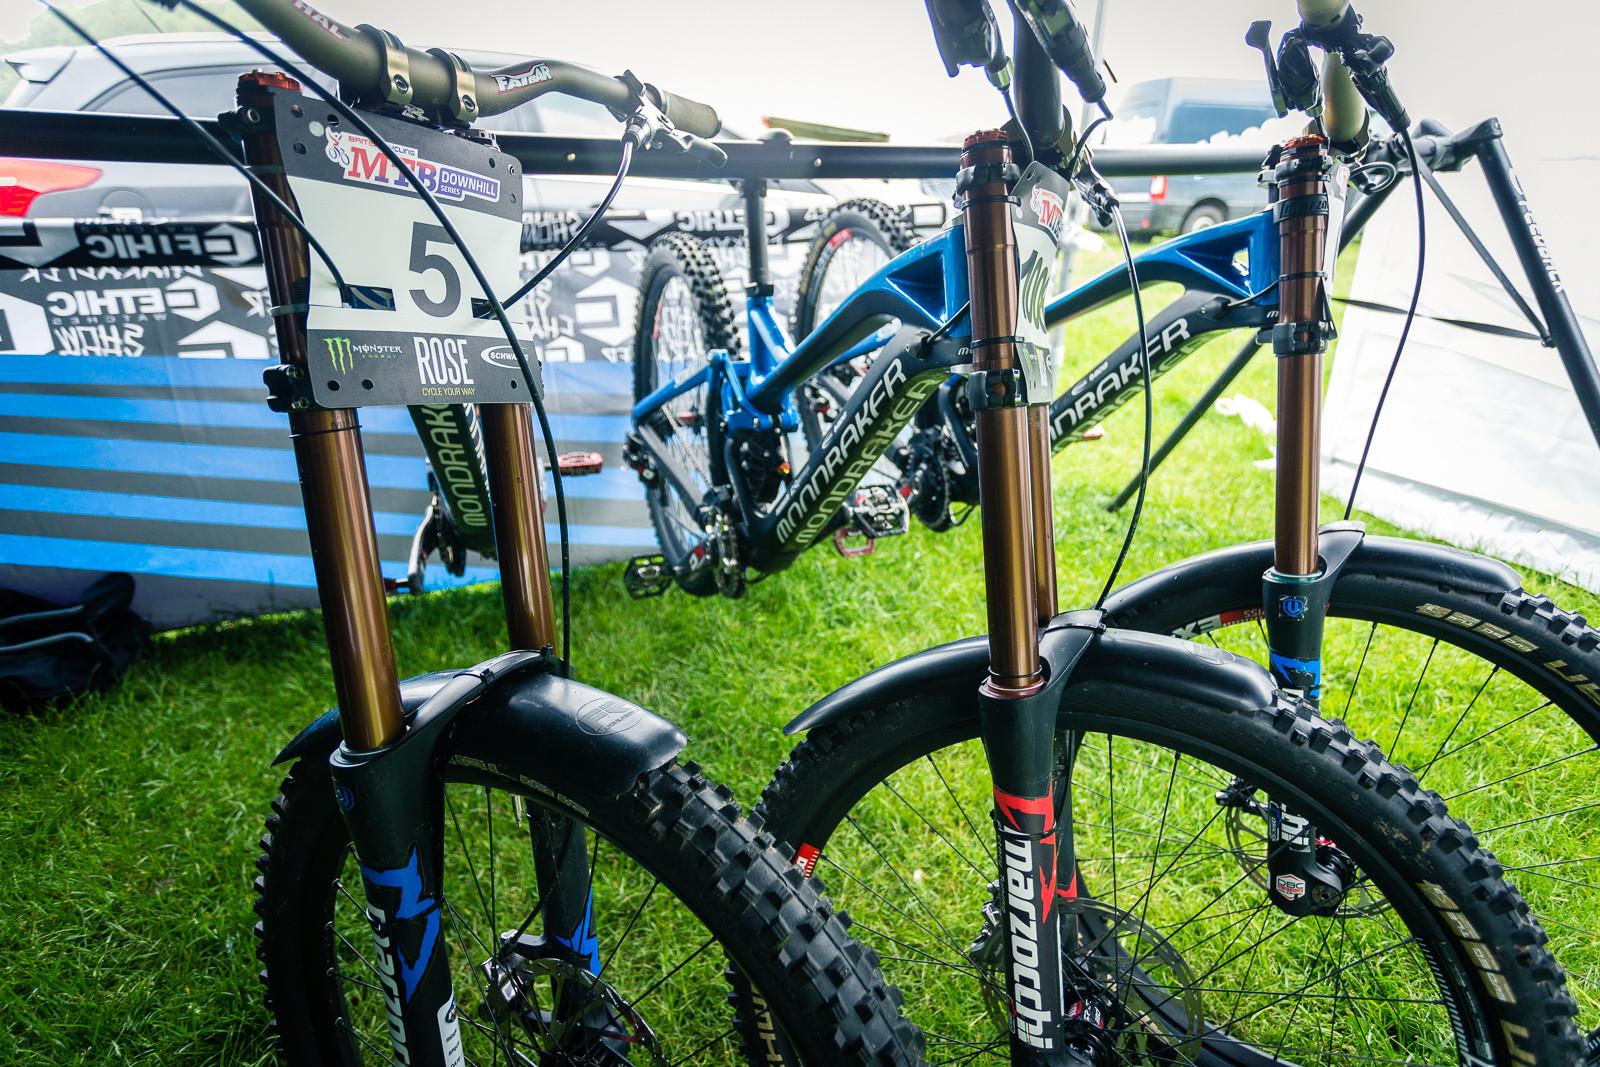 MS Mondraker Team Bikes at BDS Llangollen - PIT BITS - British Downhill Series, Llangollen - Mountain Biking Pictures - Vital MTB